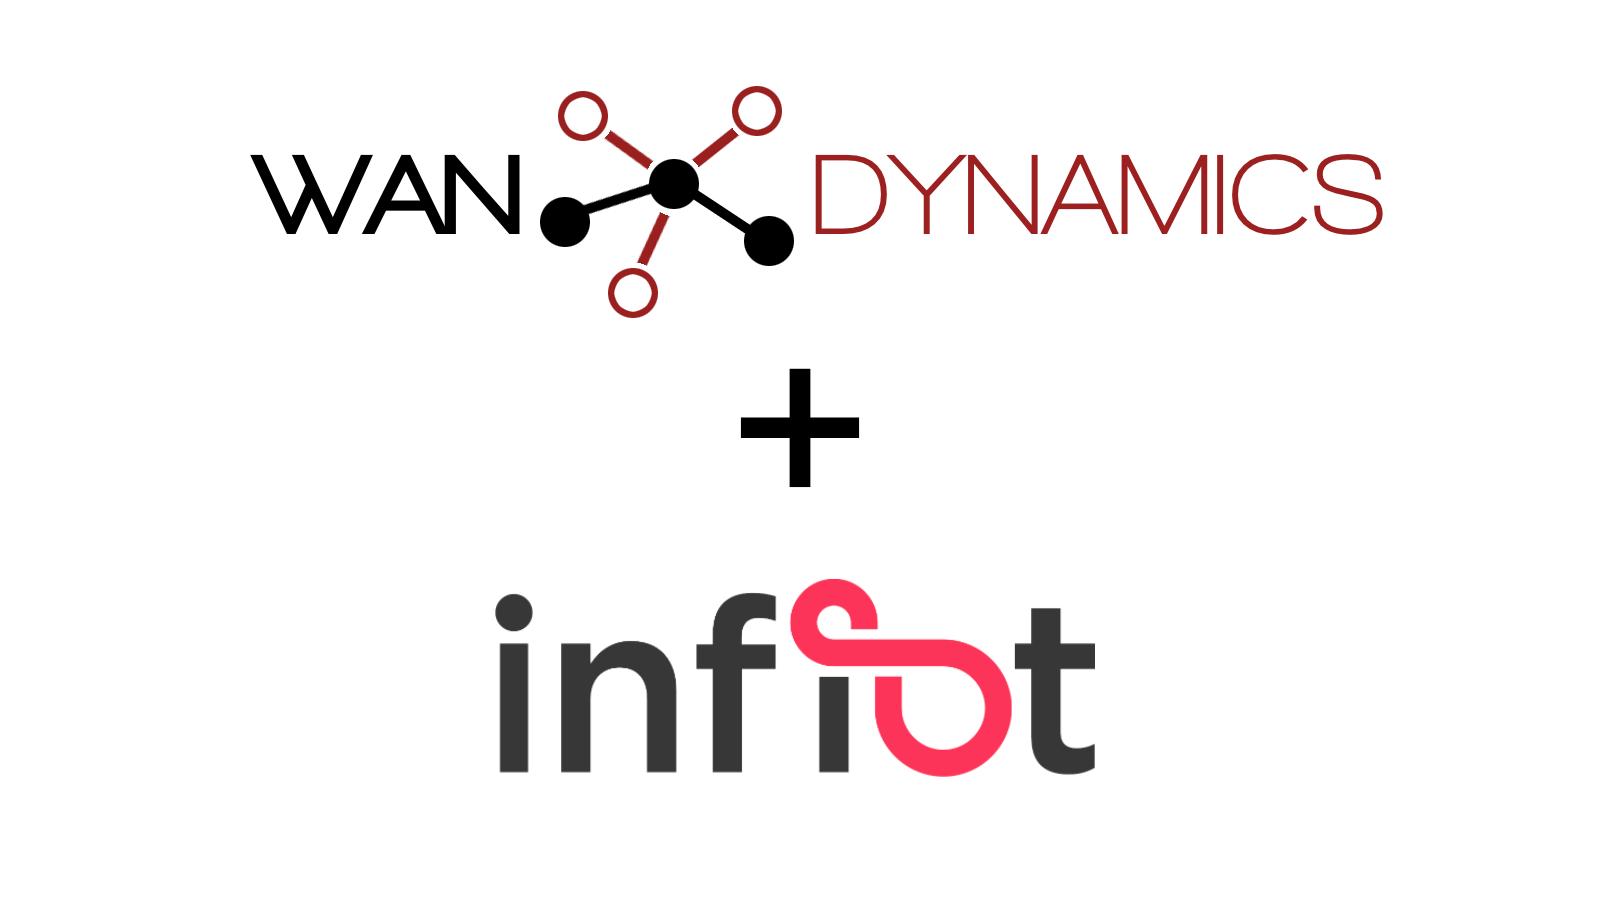 WAN Dynamics & Infiot